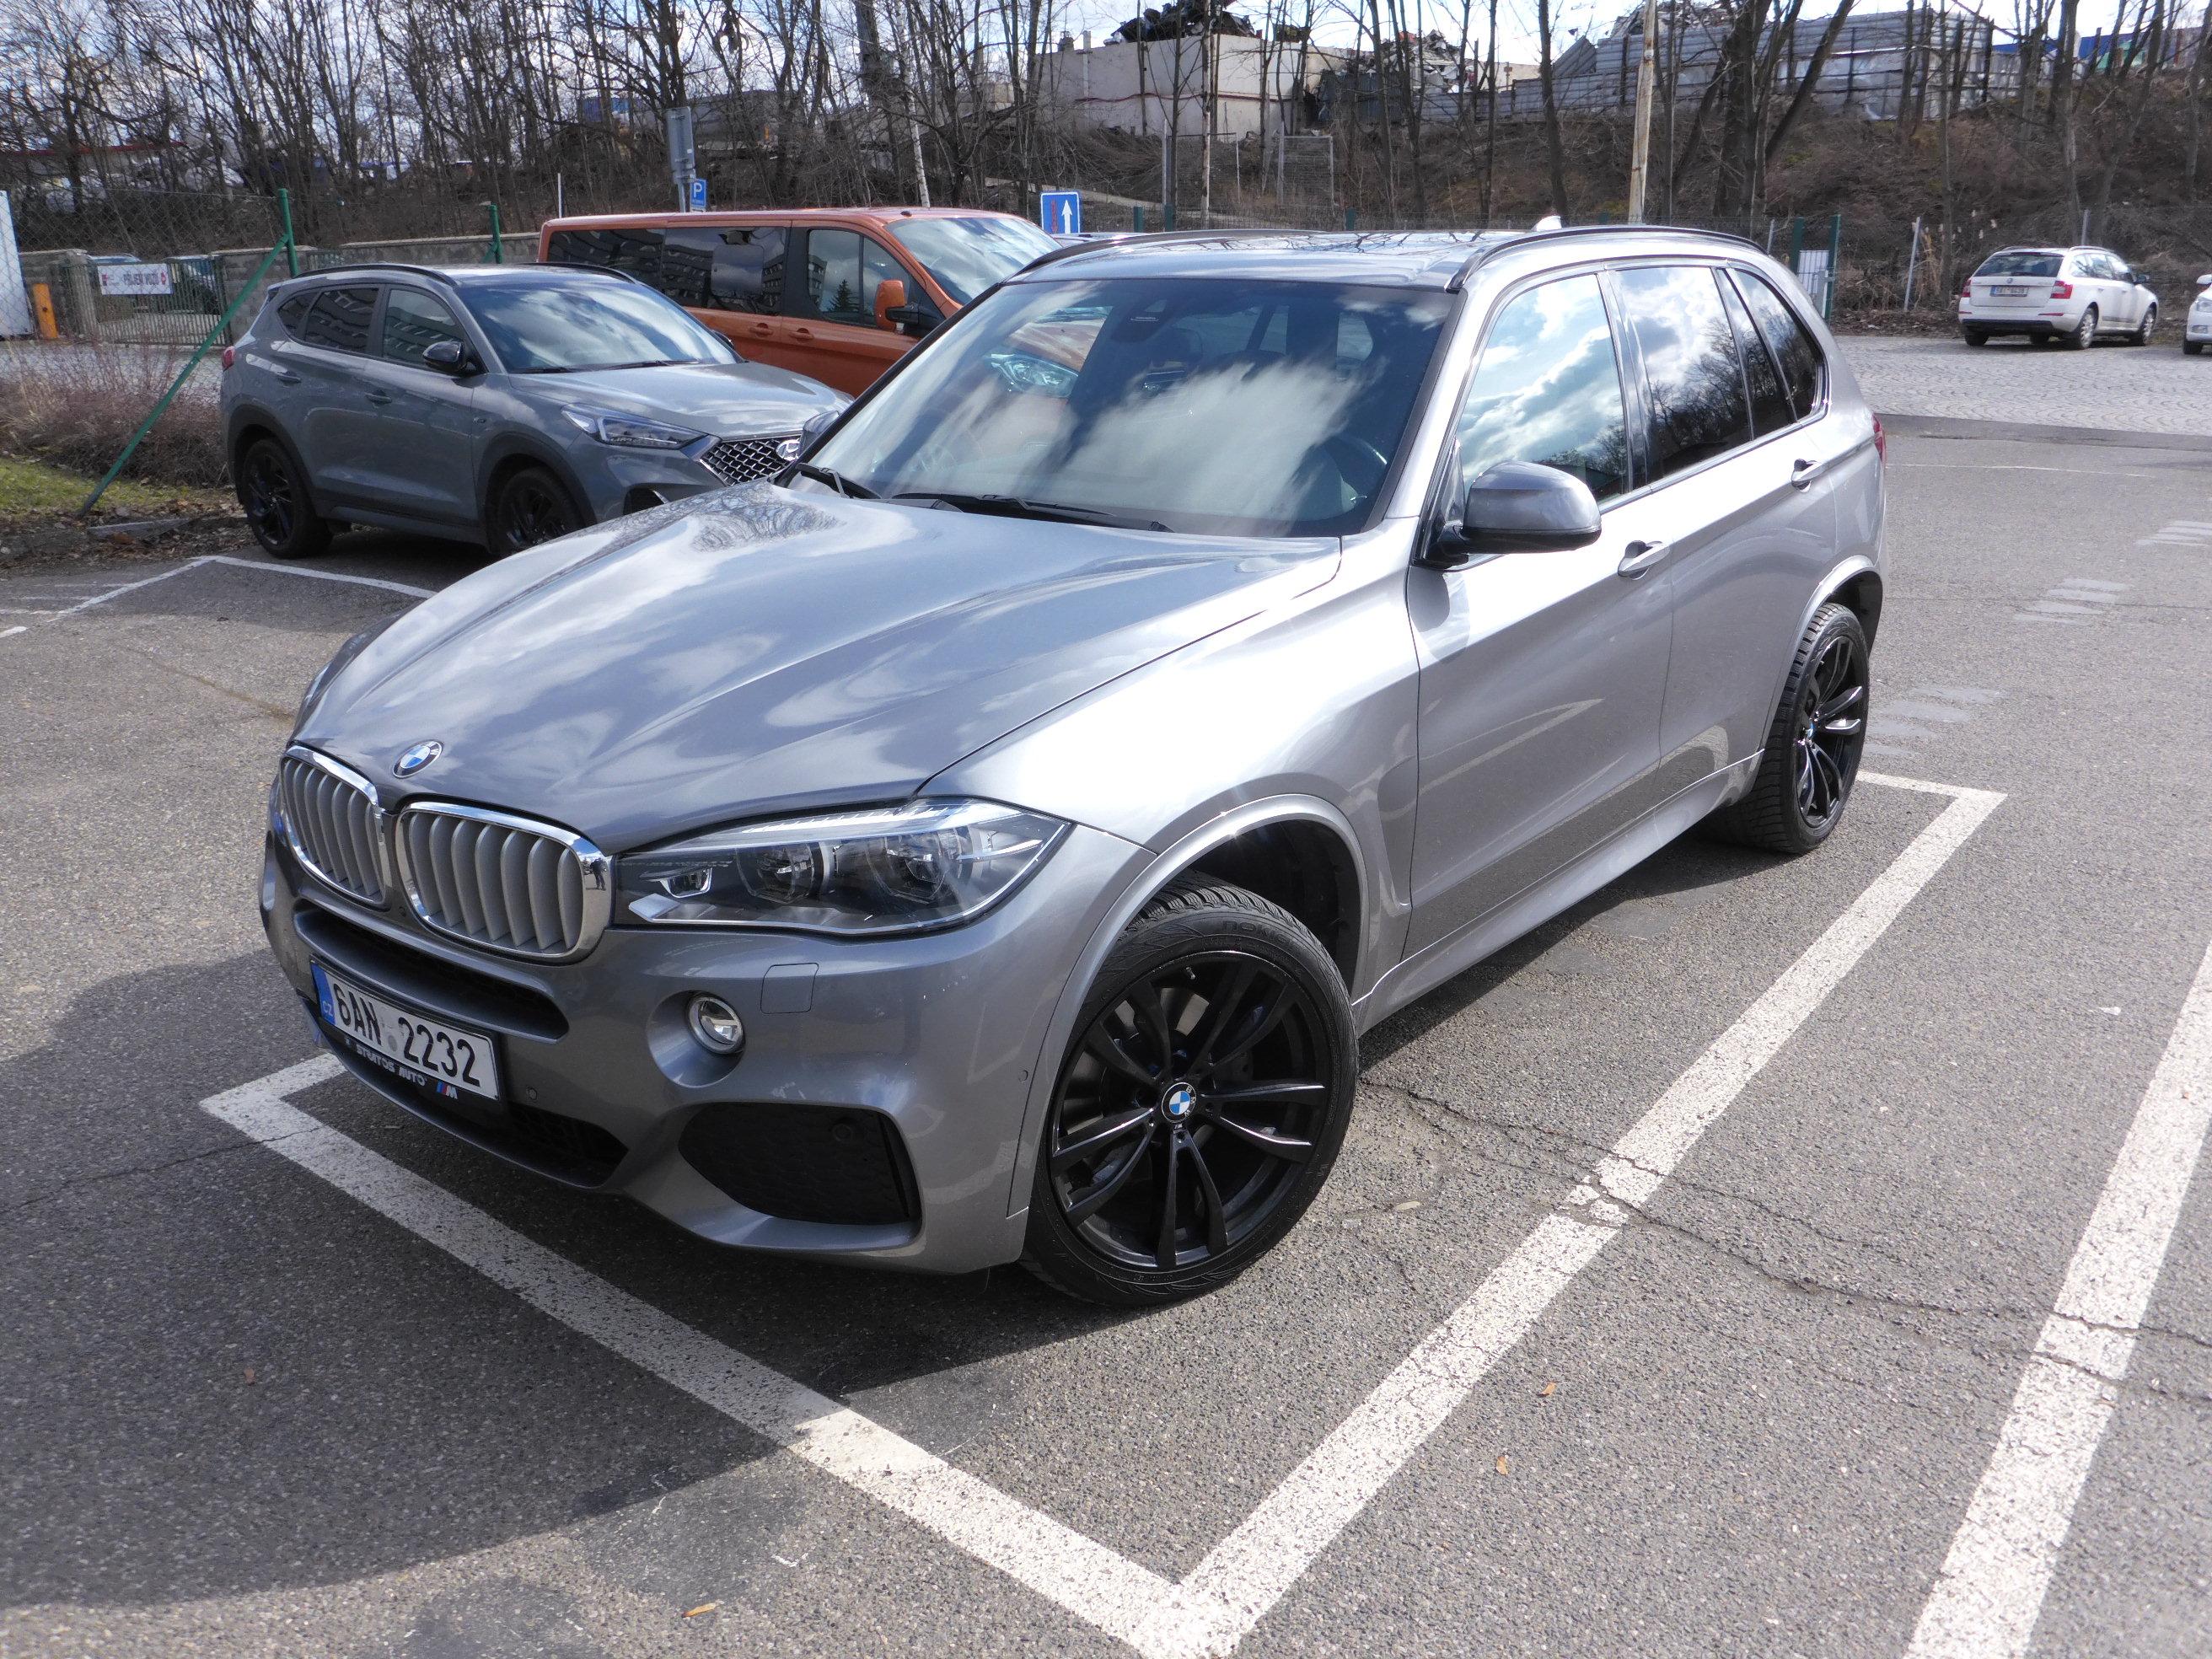 BMW - X5 III '18 5 dv. off-road